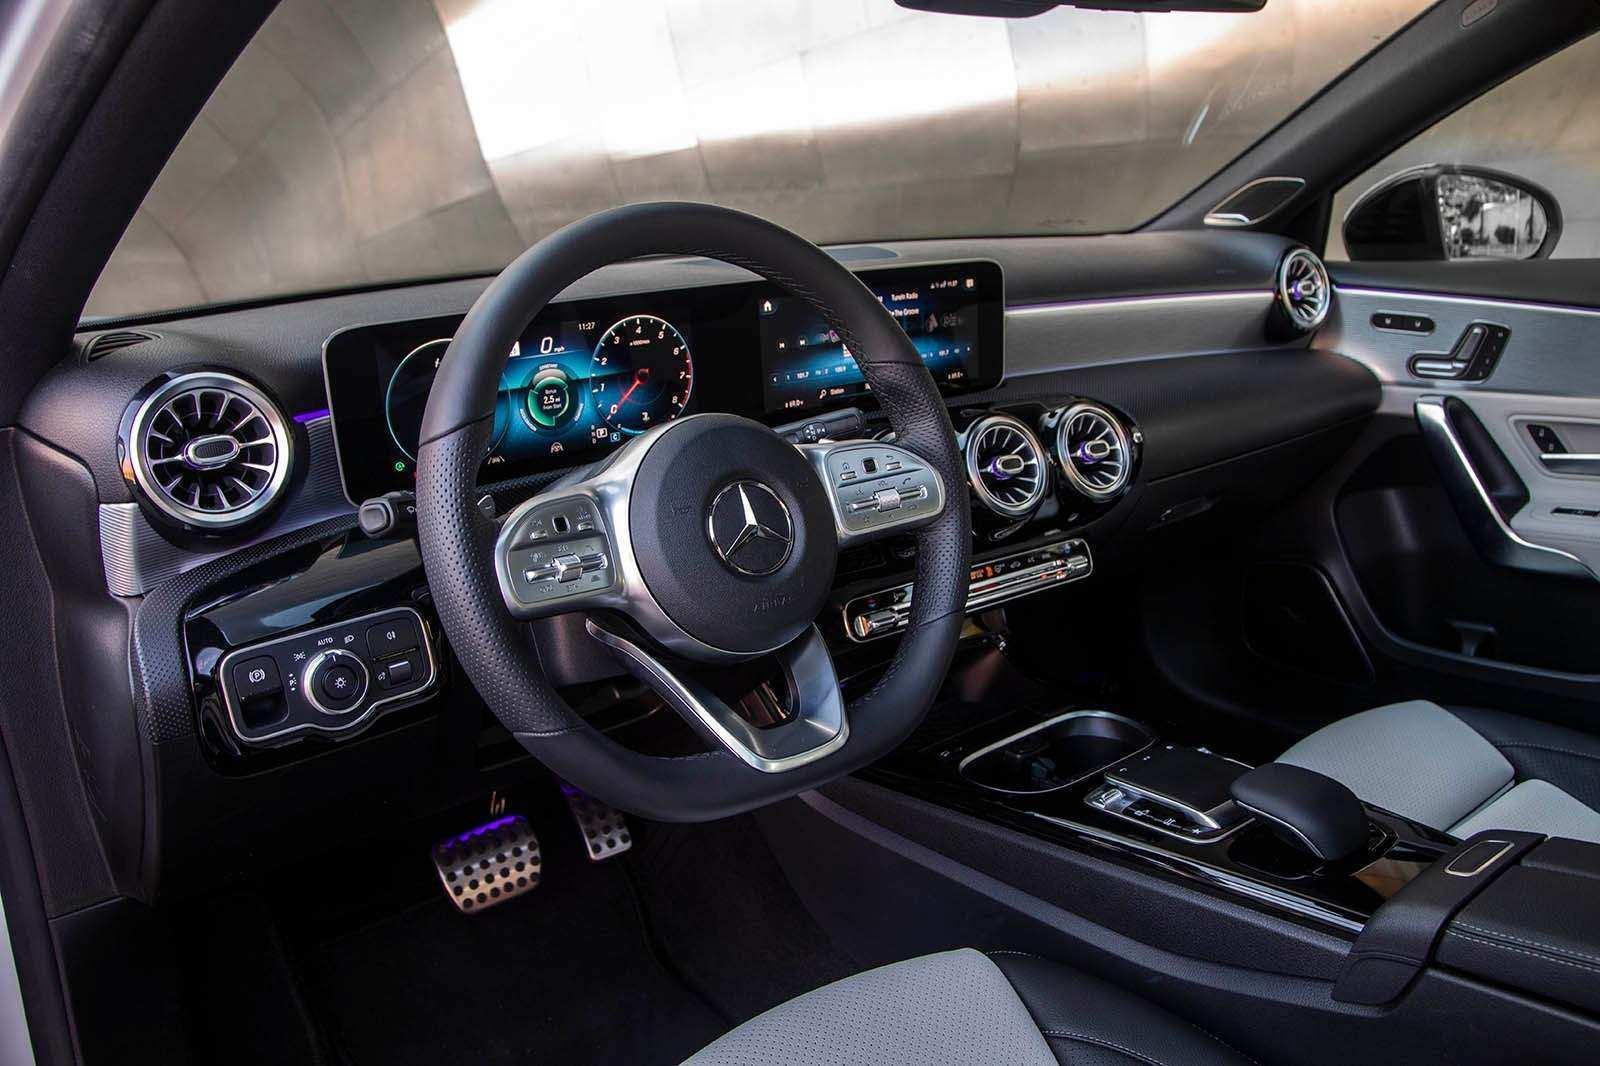 12 Concept of Mercedes A Class 2019 Interior History for Mercedes A Class 2019 Interior